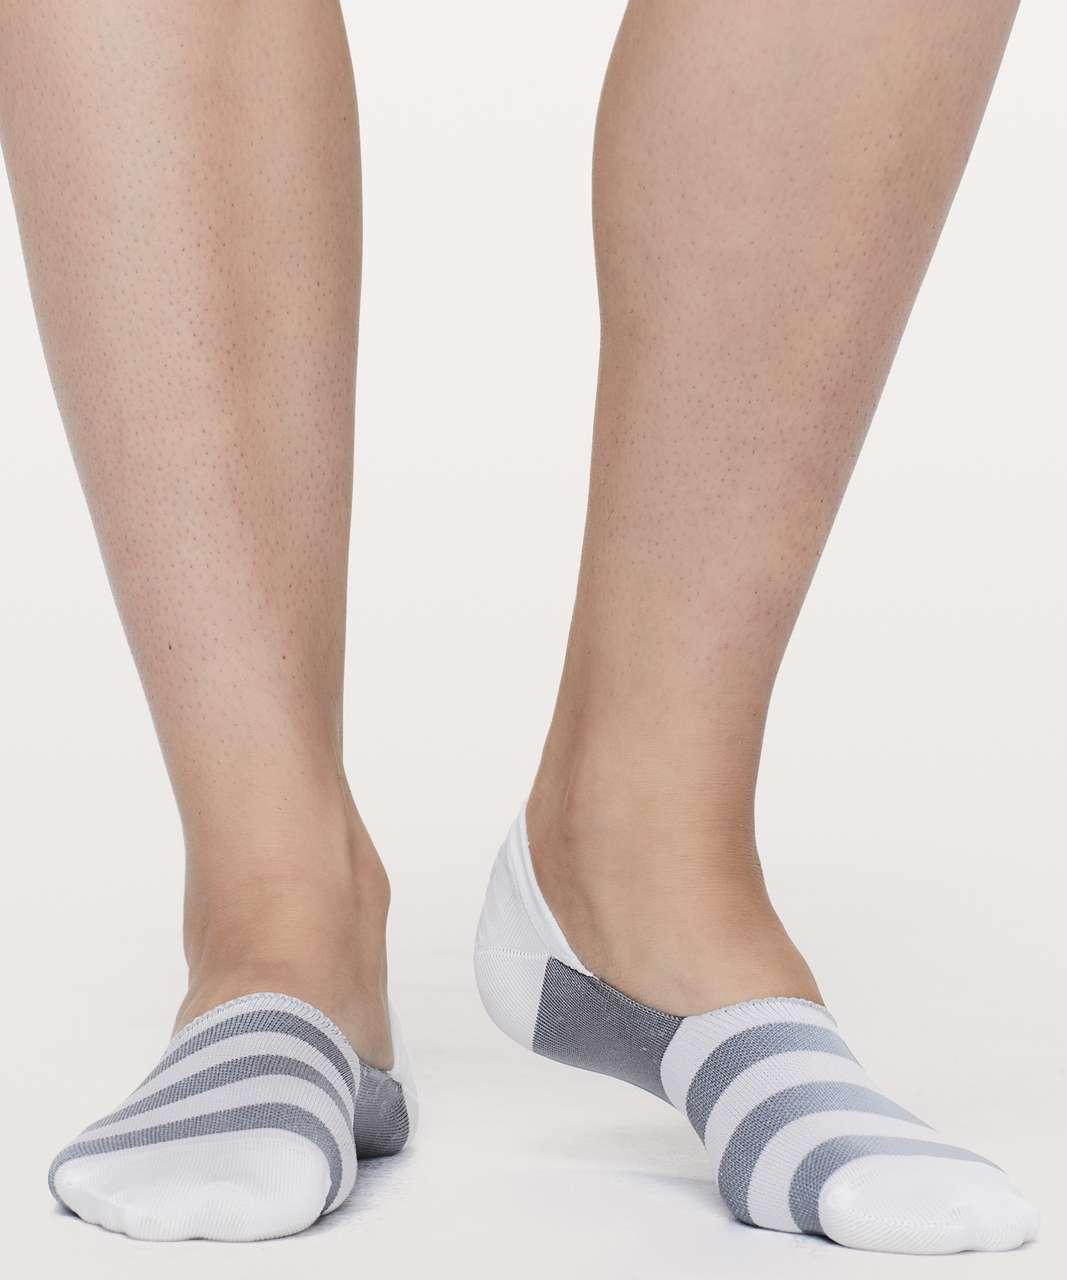 Lululemon Secret Sock - Arctic Grey / White